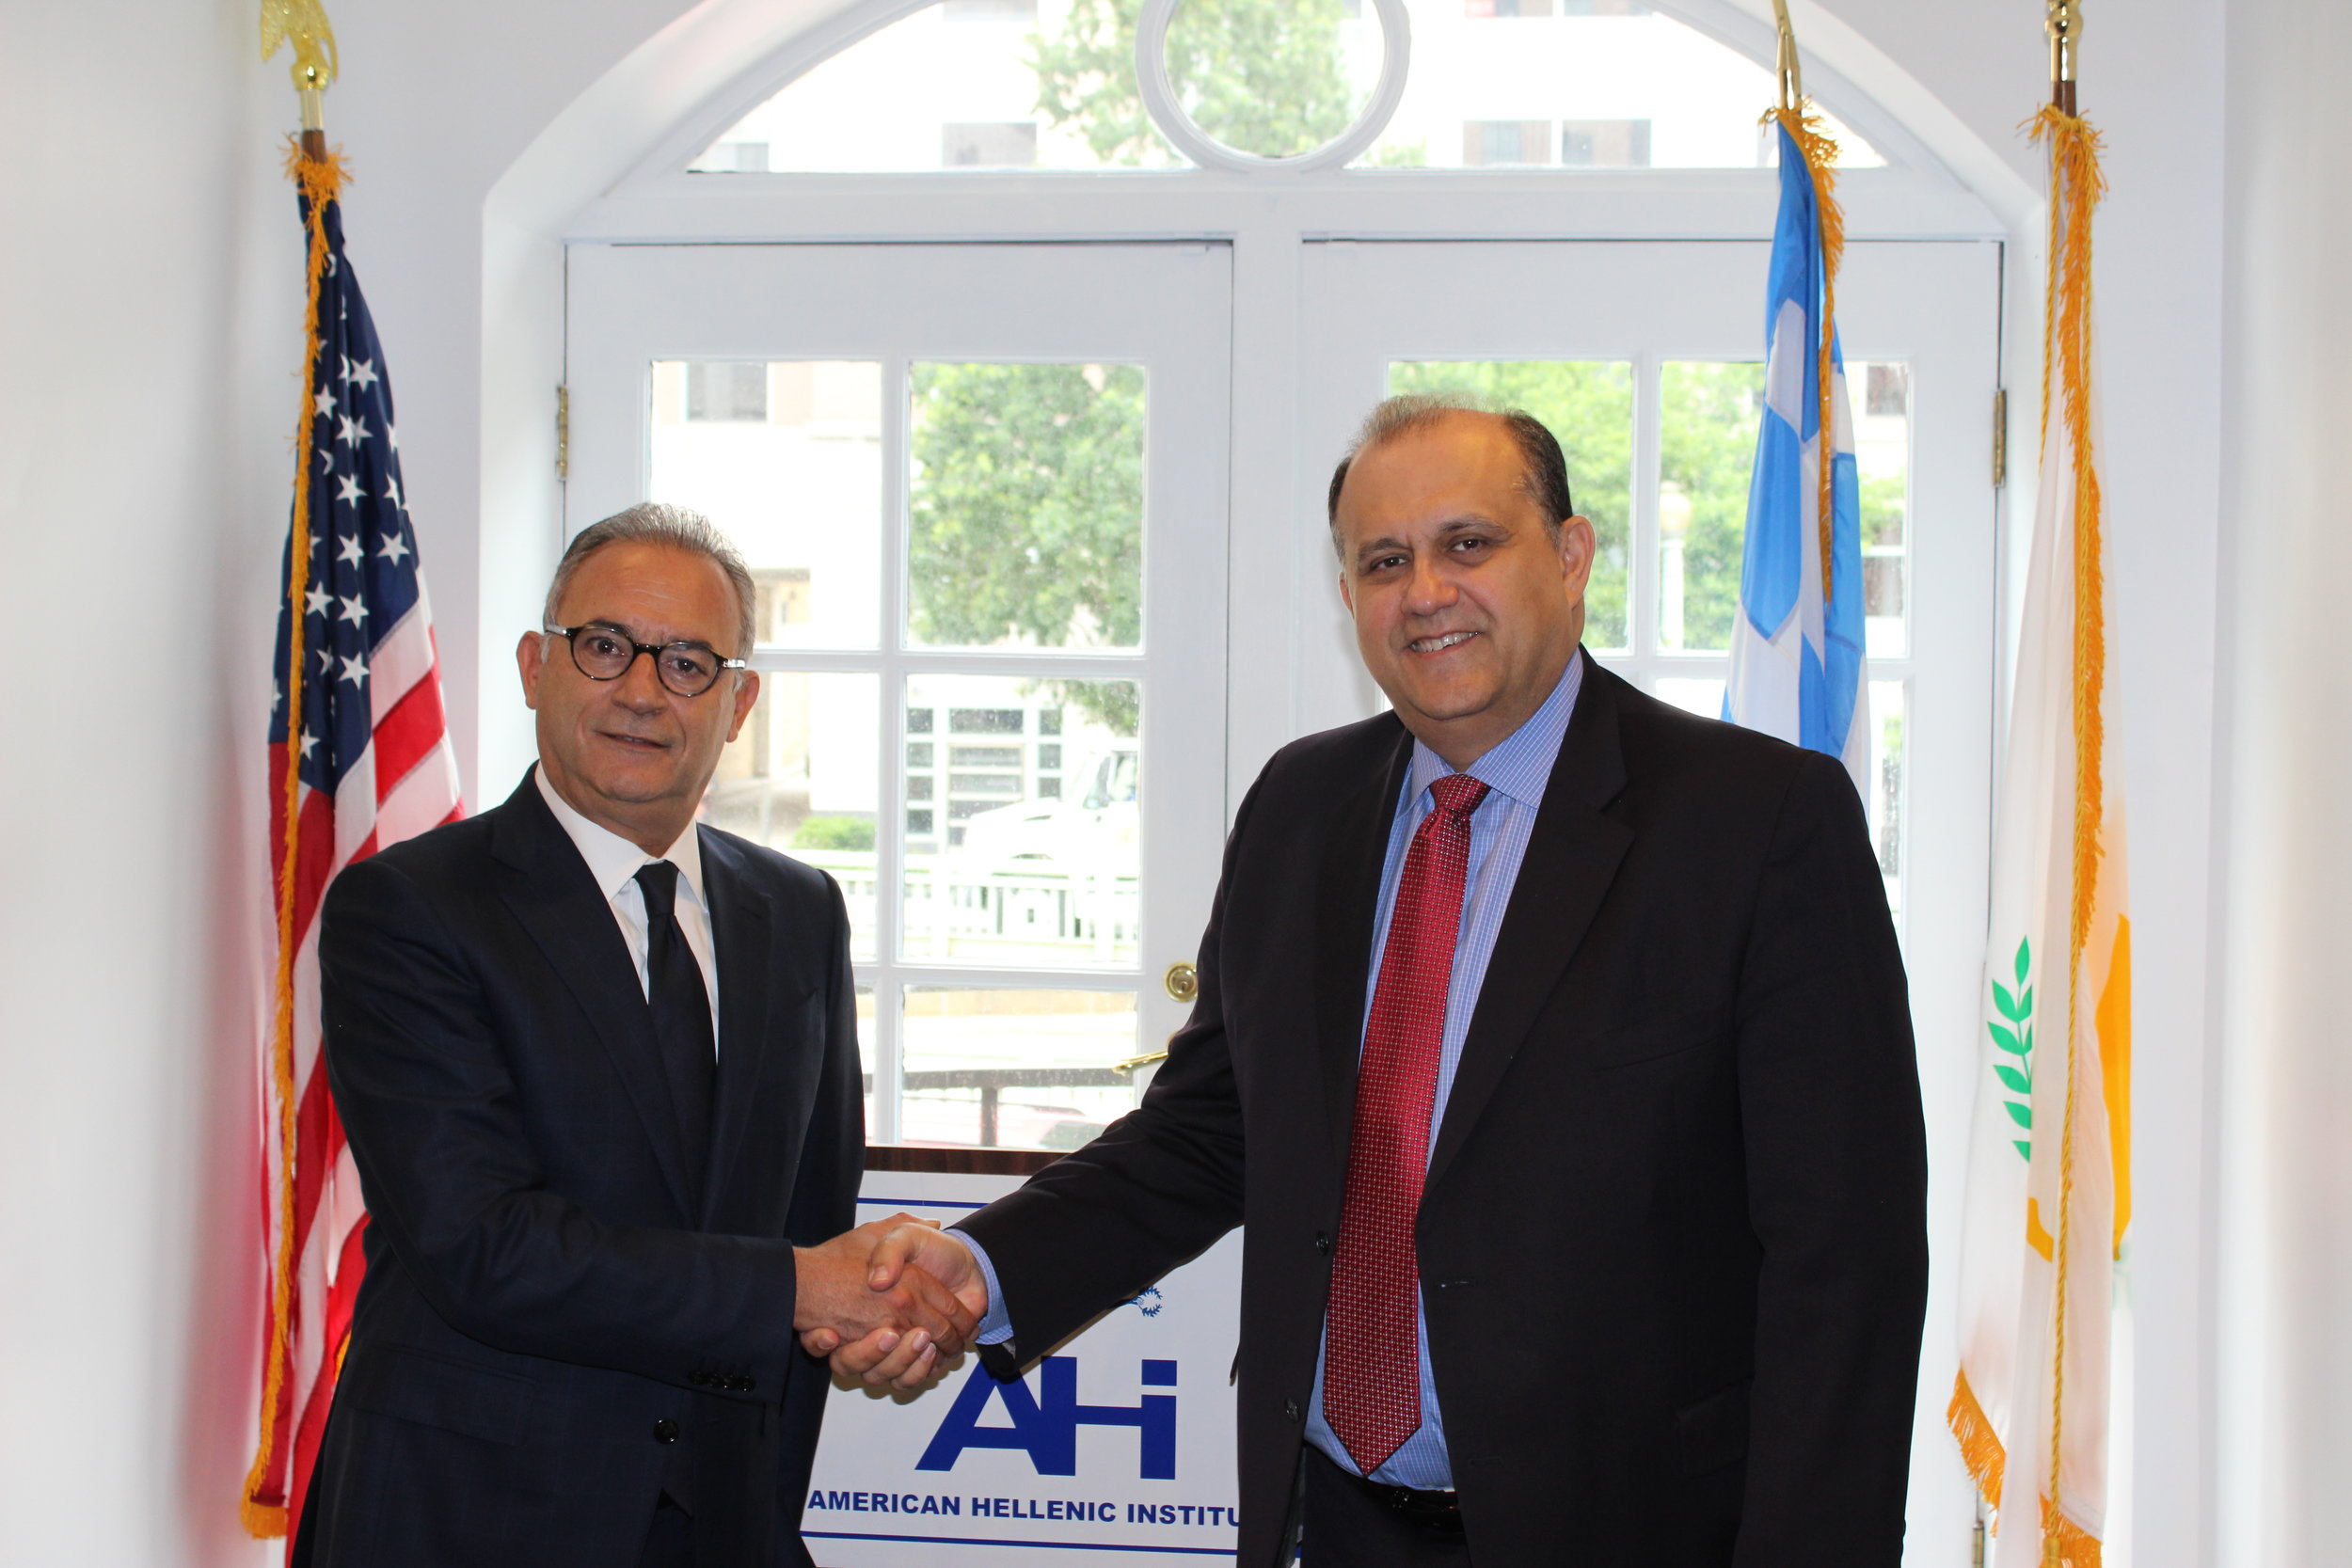 Mr. Averof Neophytou, President of Disy and Mr. Nick Larigakis, President of AHI.